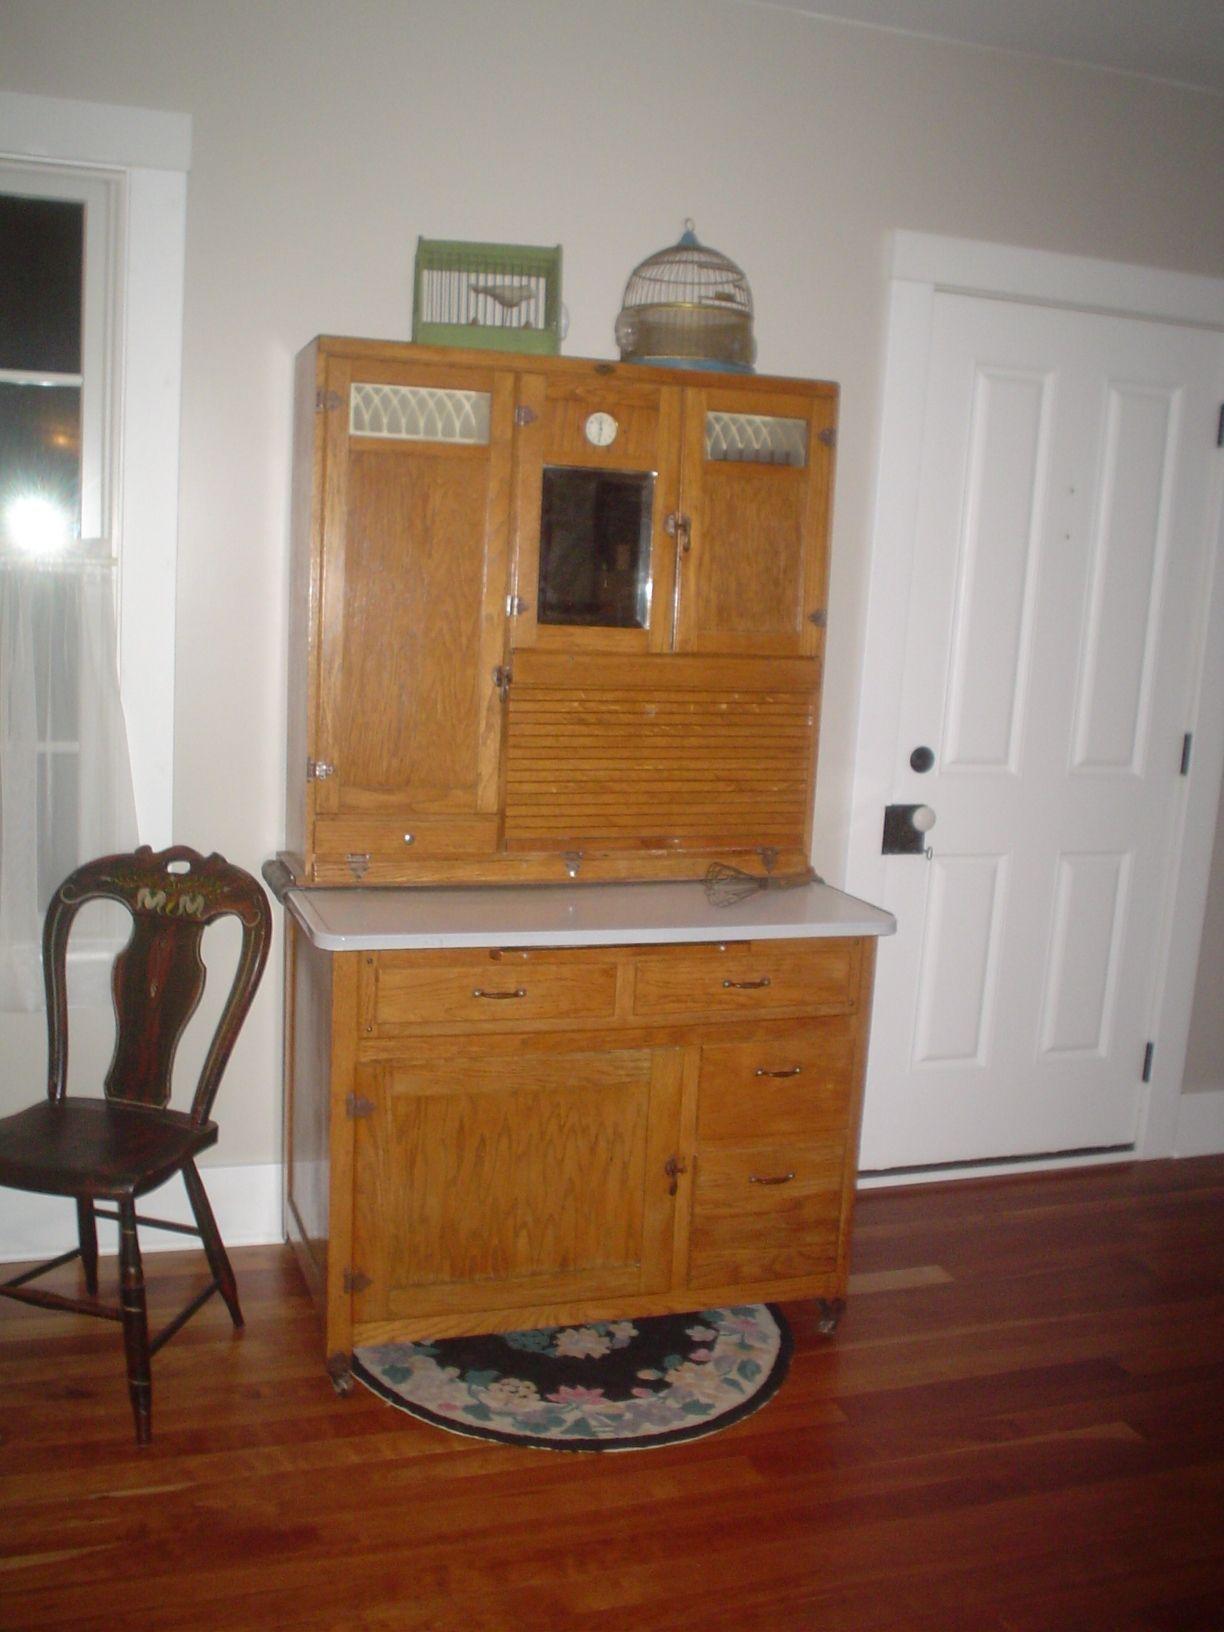 1929 Boone Hoosier Cupboard & 1929 Boone Hoosier Cupboard | Bob and Elaineu0027s House | Pinterest ...